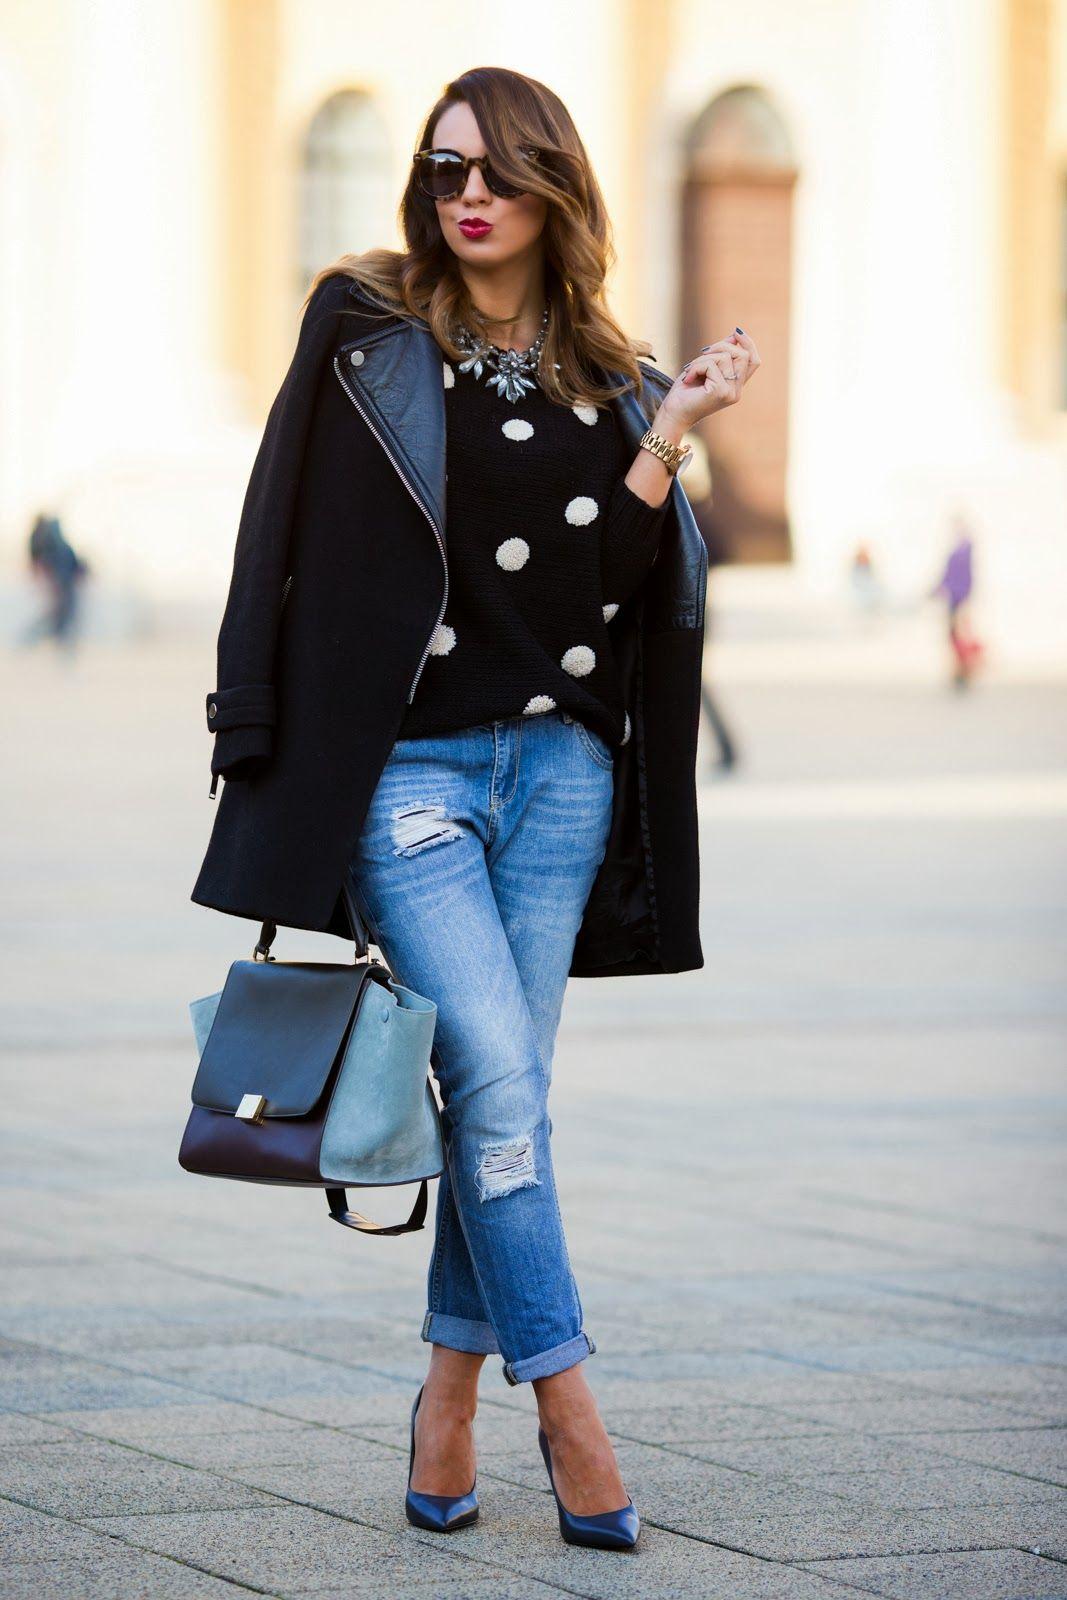 Coat and heels zara sweater forever jeans mango bag